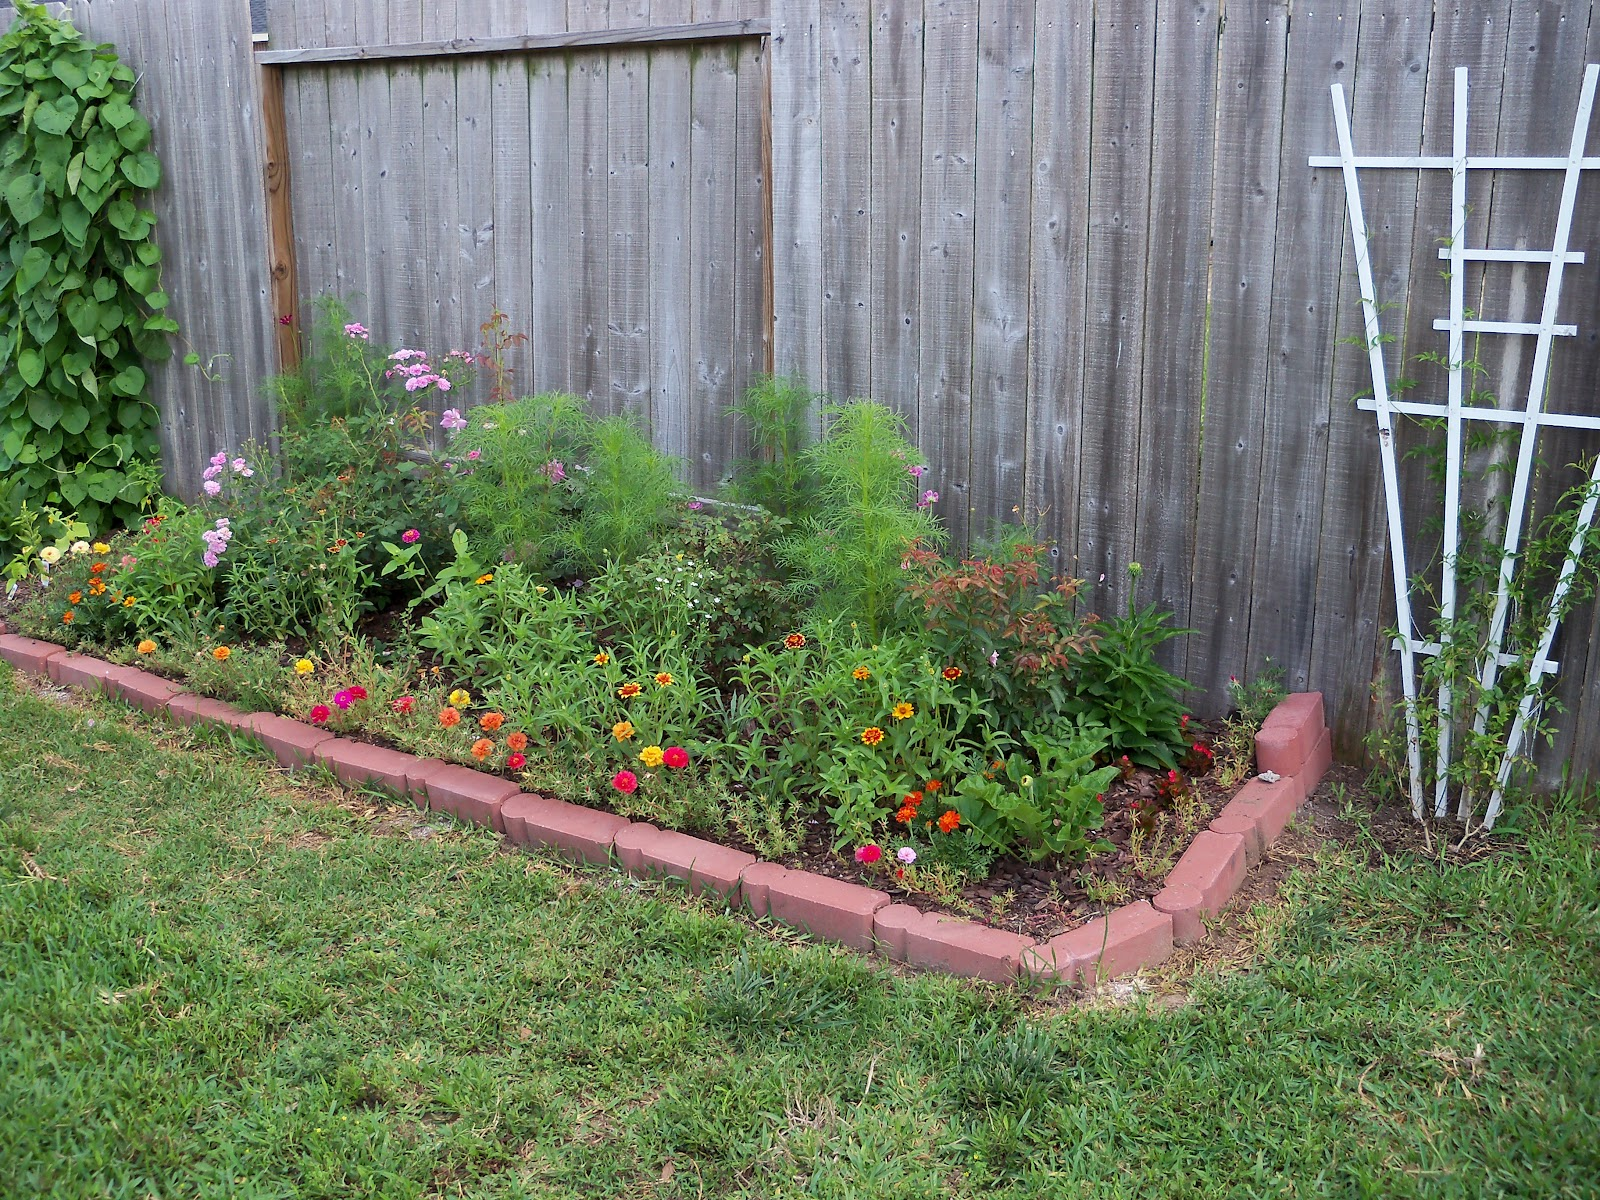 Gardening 2010, Part Two - 101_2556.JPG